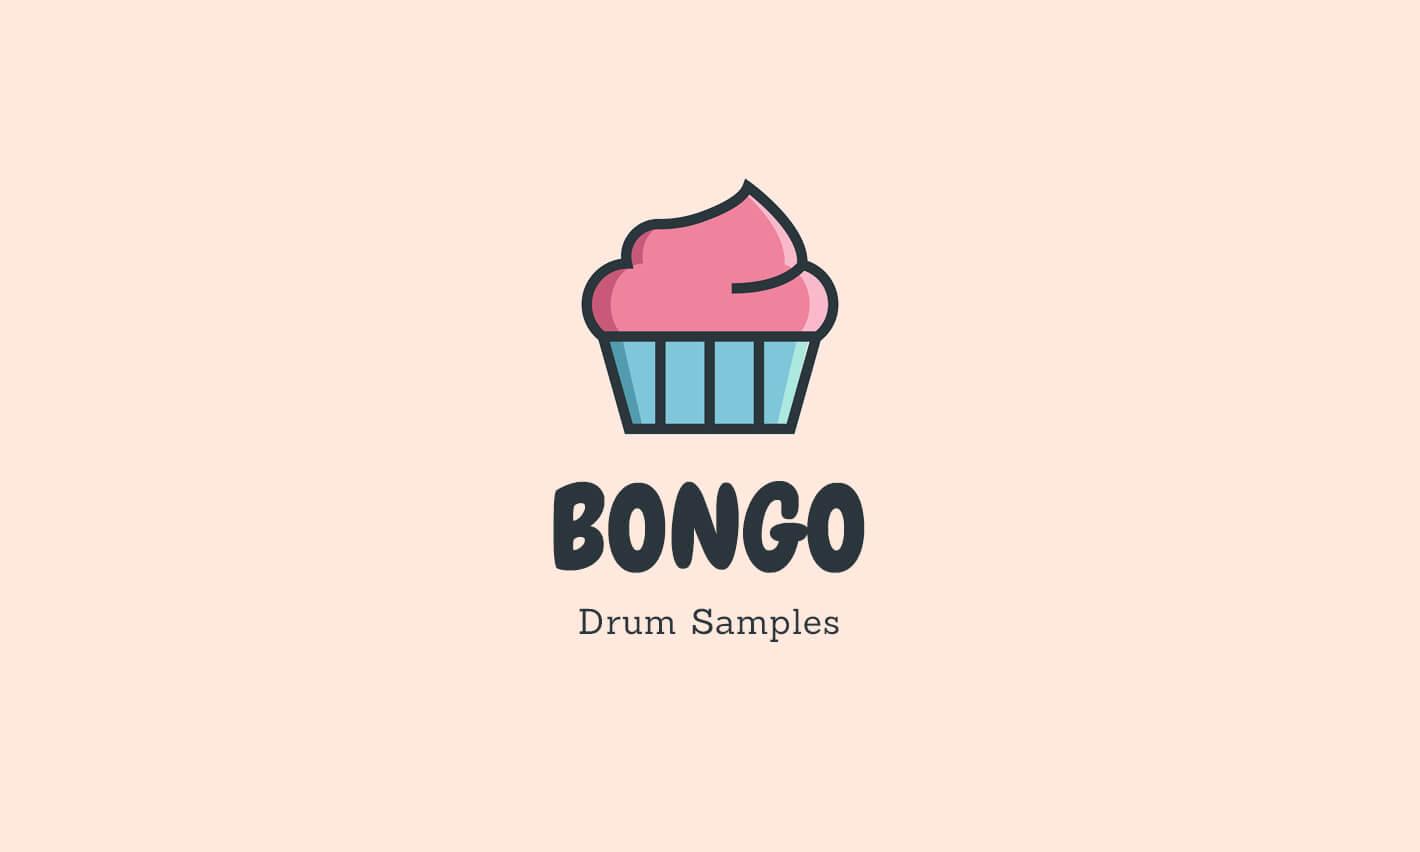 bongo sound drum samples - wavbvkery